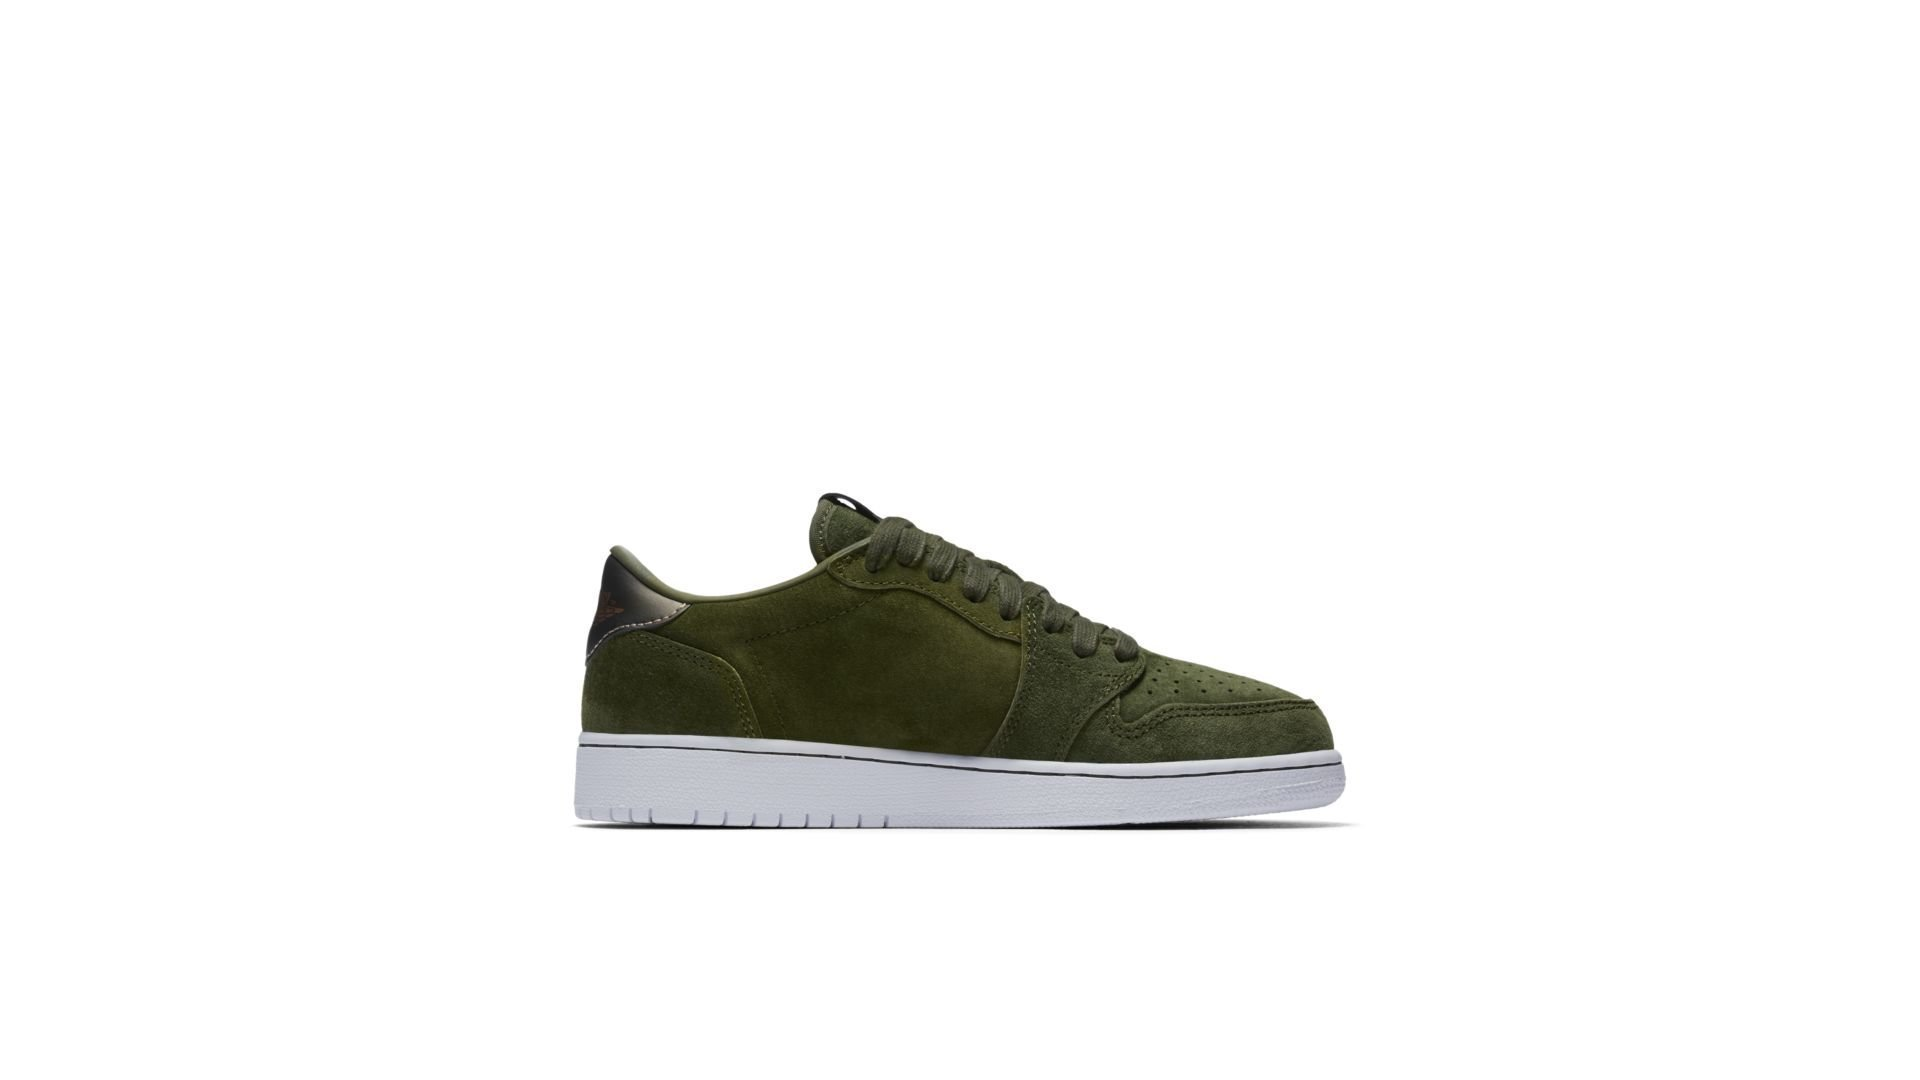 Jordan 1 Retro Low NS Legion Green (GS) (919705-330)